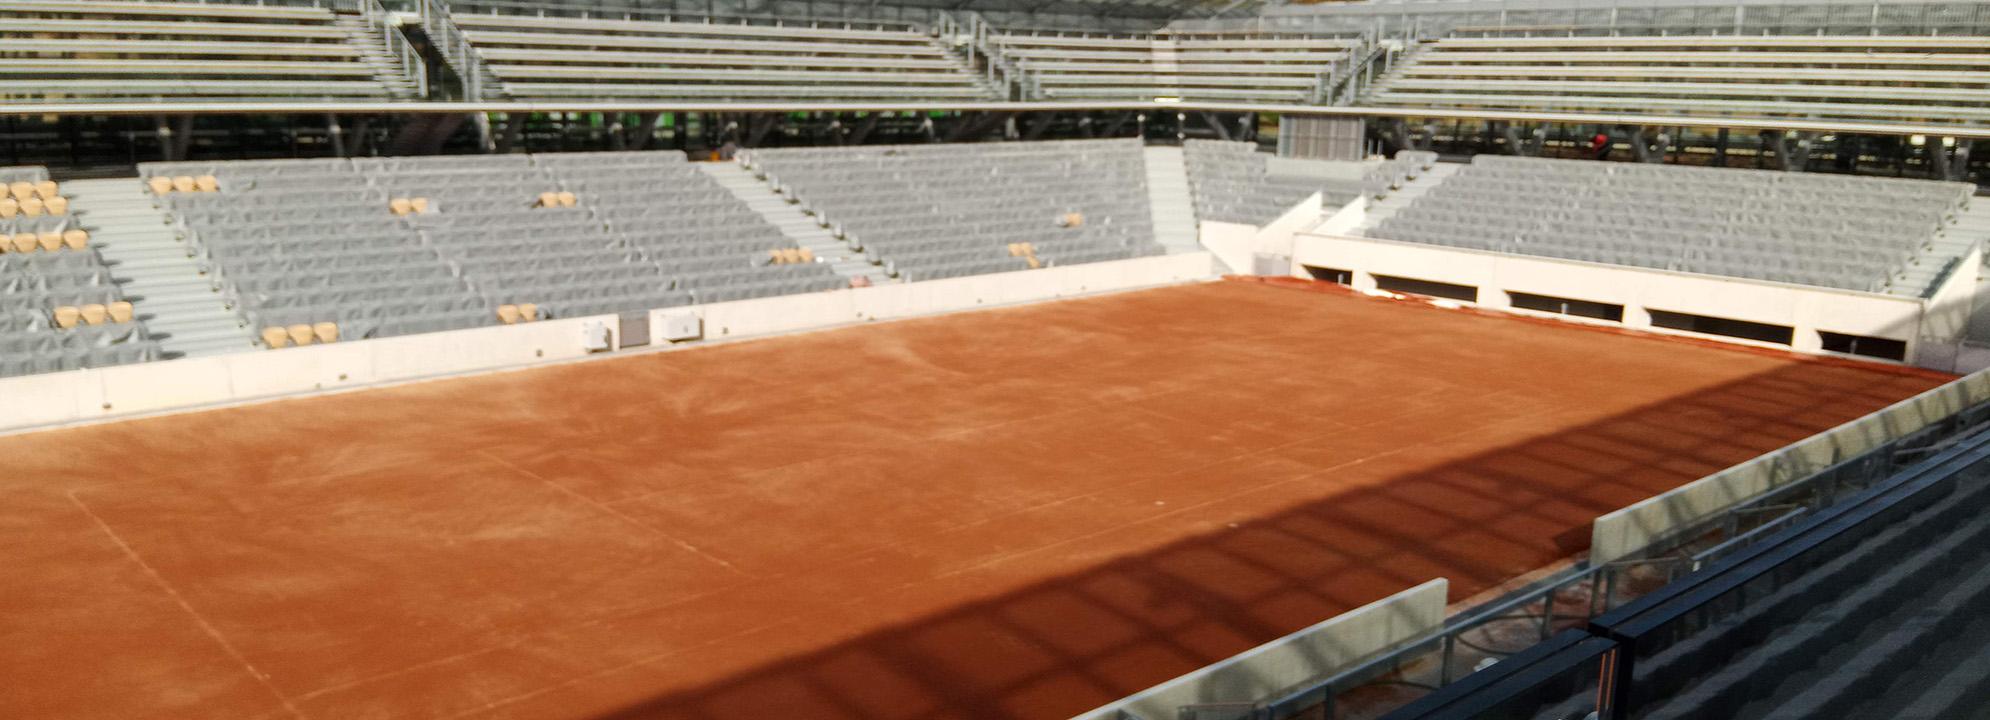 Cours des Serres Roland Garros